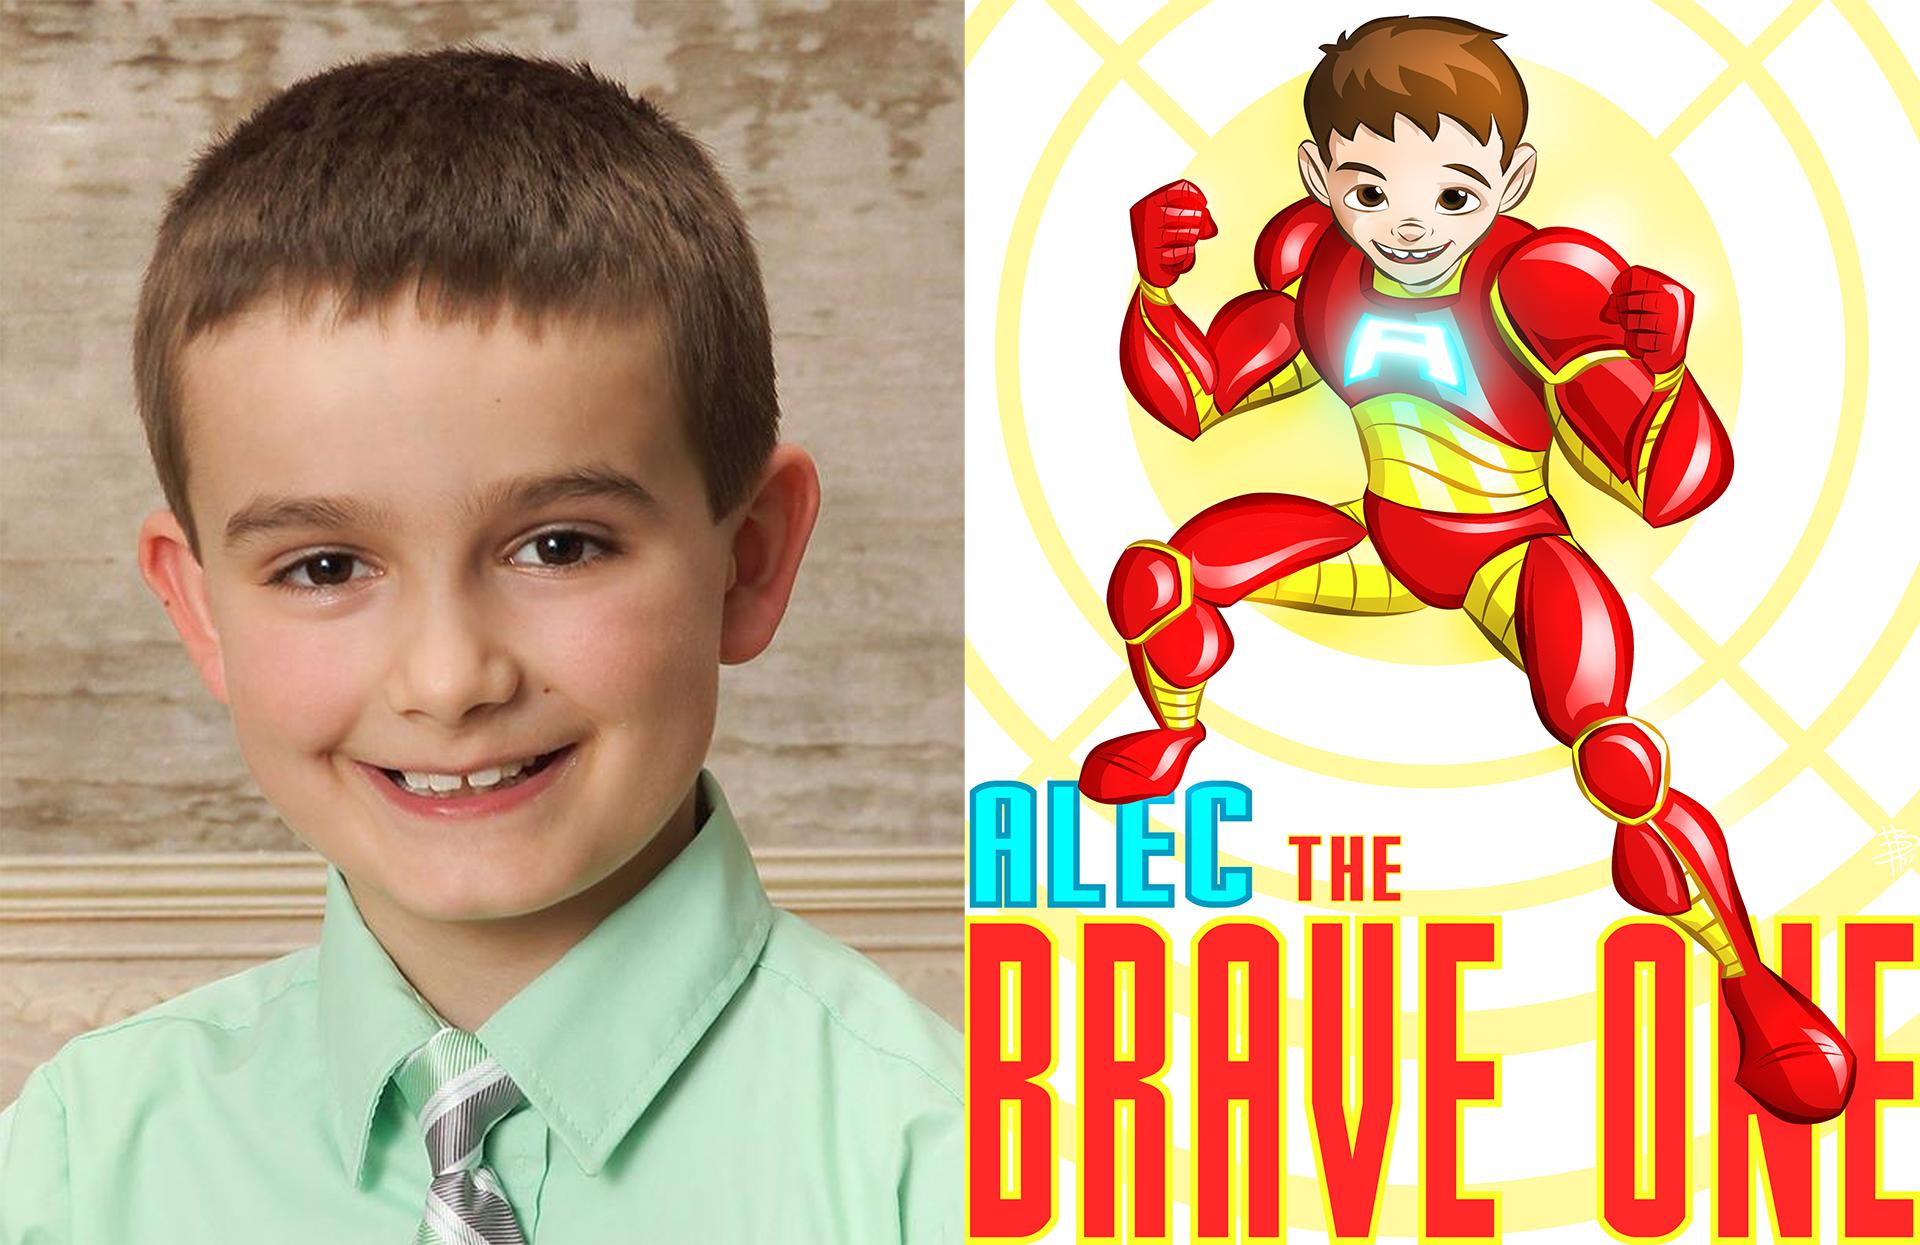 Alec (Alec the Brave One)